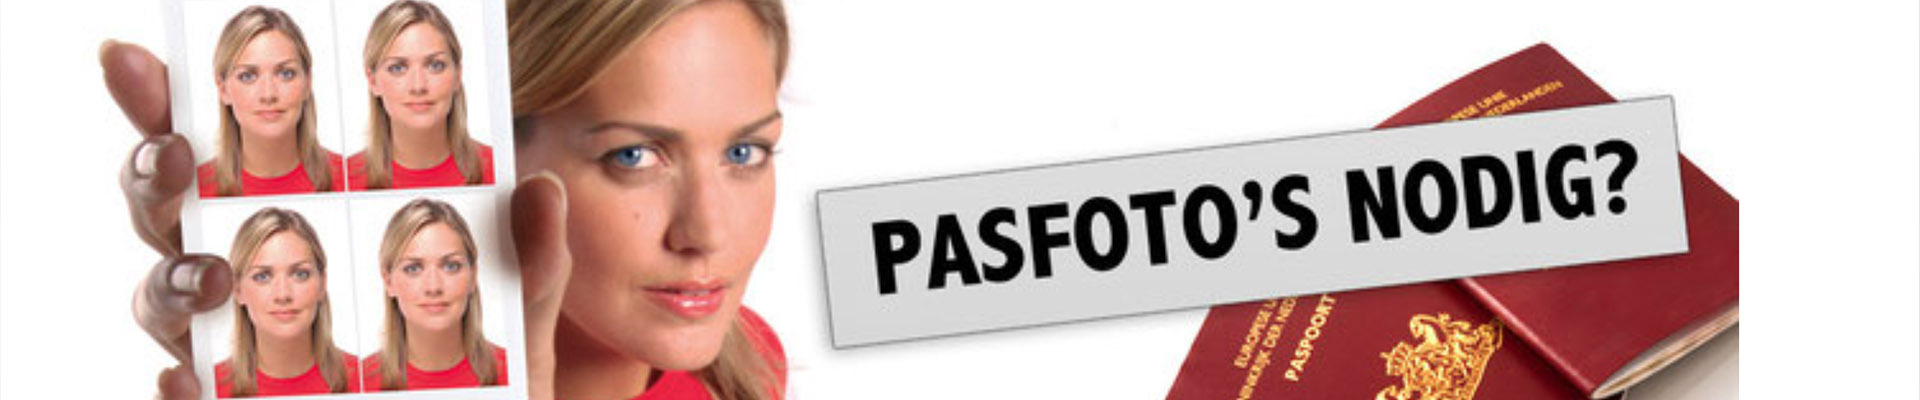 Slider-pasfoto